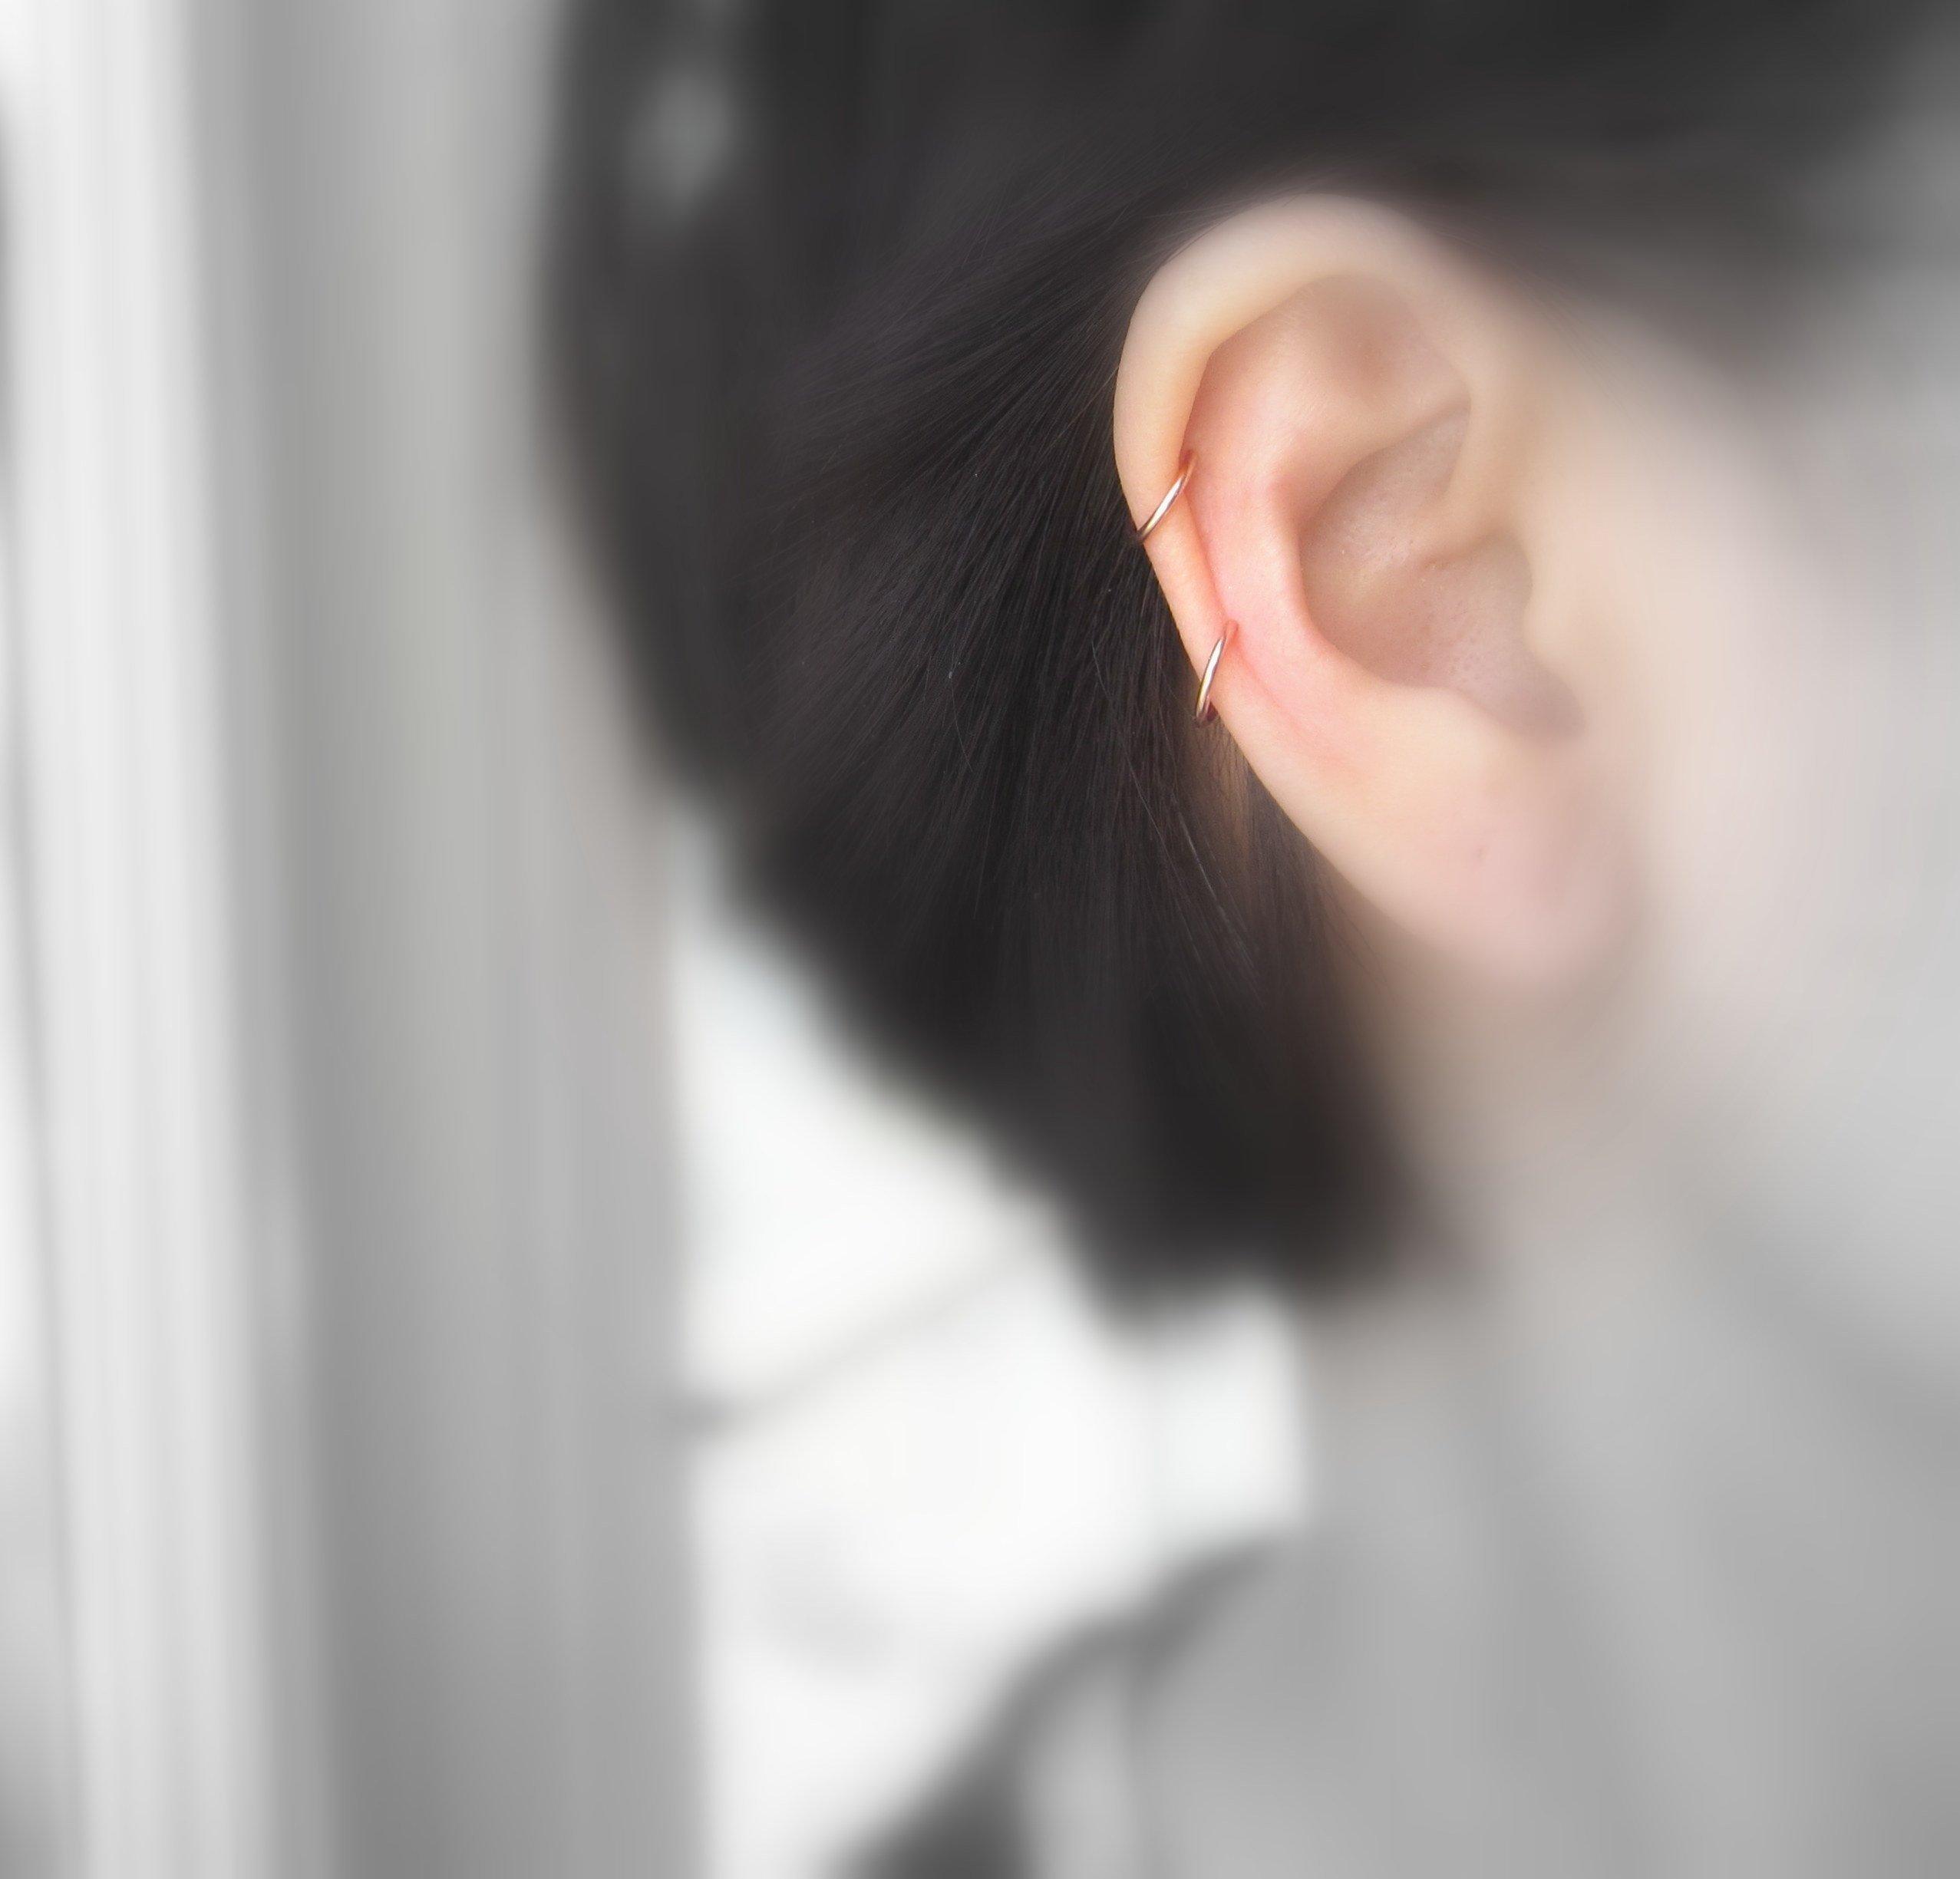 14K Rose Gold Small Hoop Earrings for 2nd Piercing Cartilage 18G 8mm Handmade One Pair